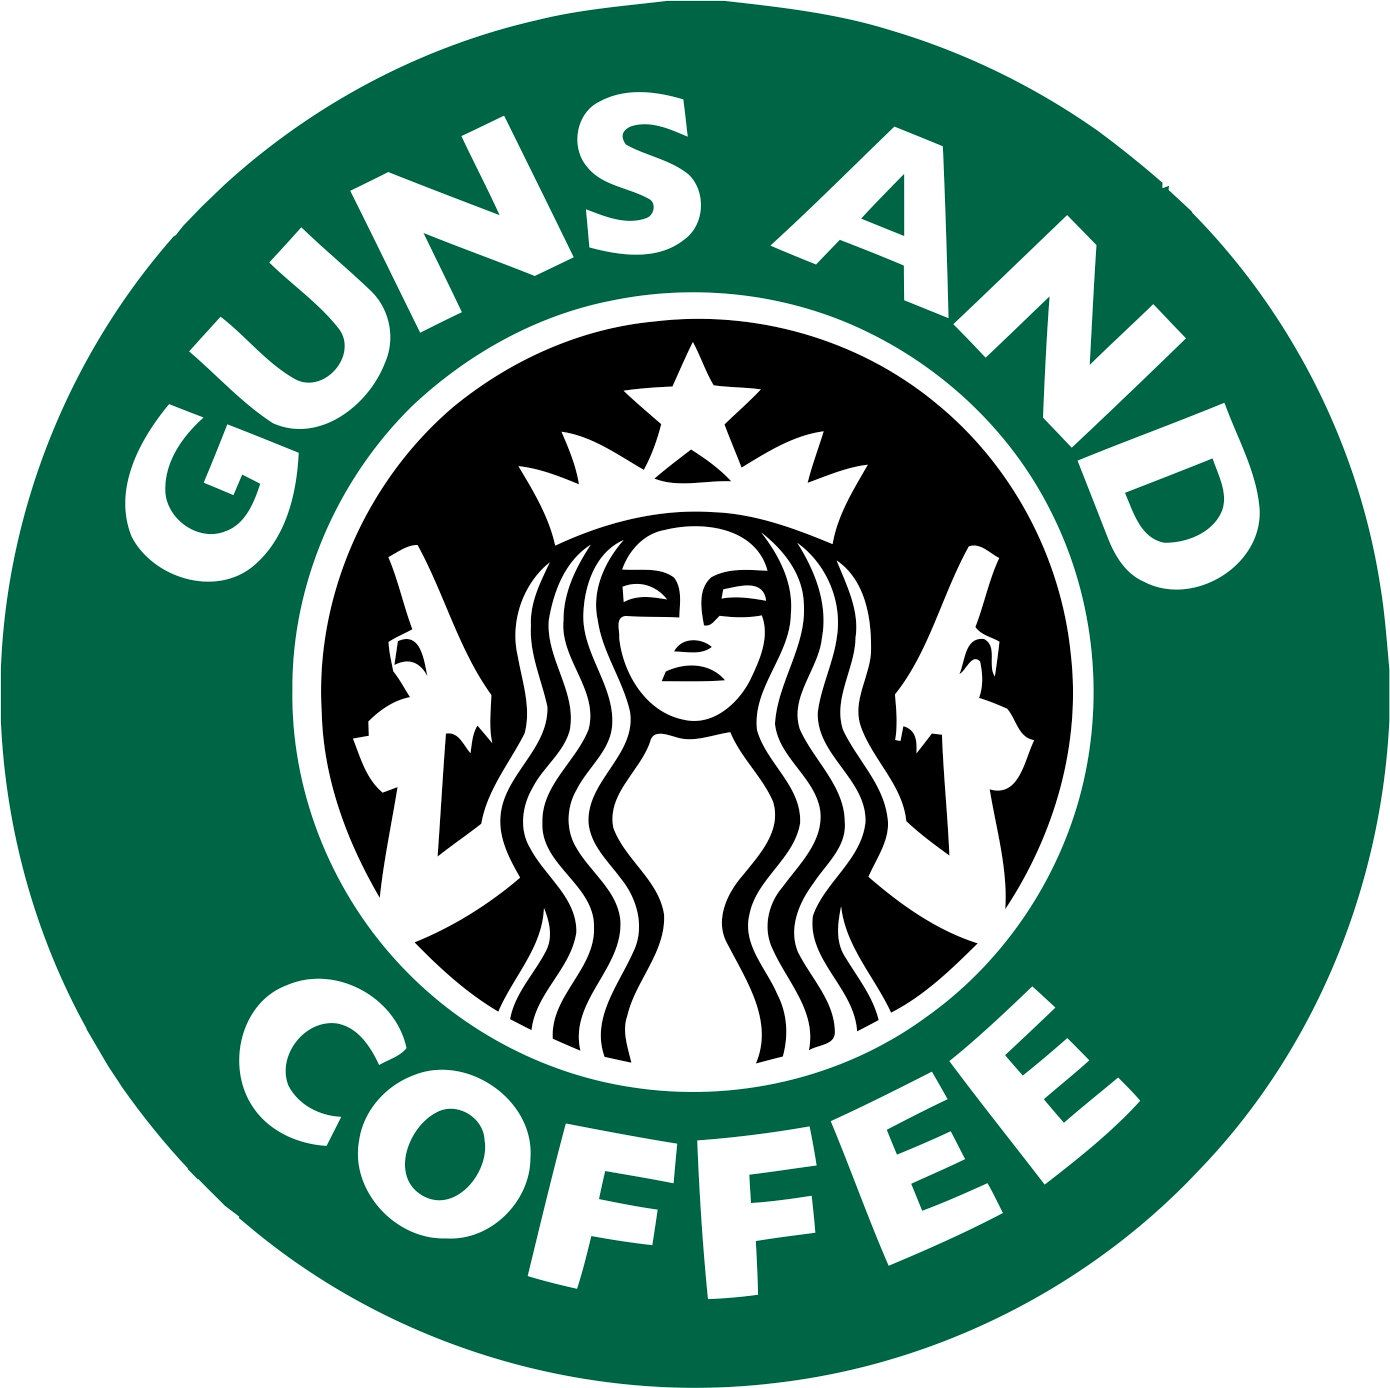 Car sticker family maker - Guns And Coffee Starbucks Bumper Sticker Pro Guns Car Decal 5 X 5